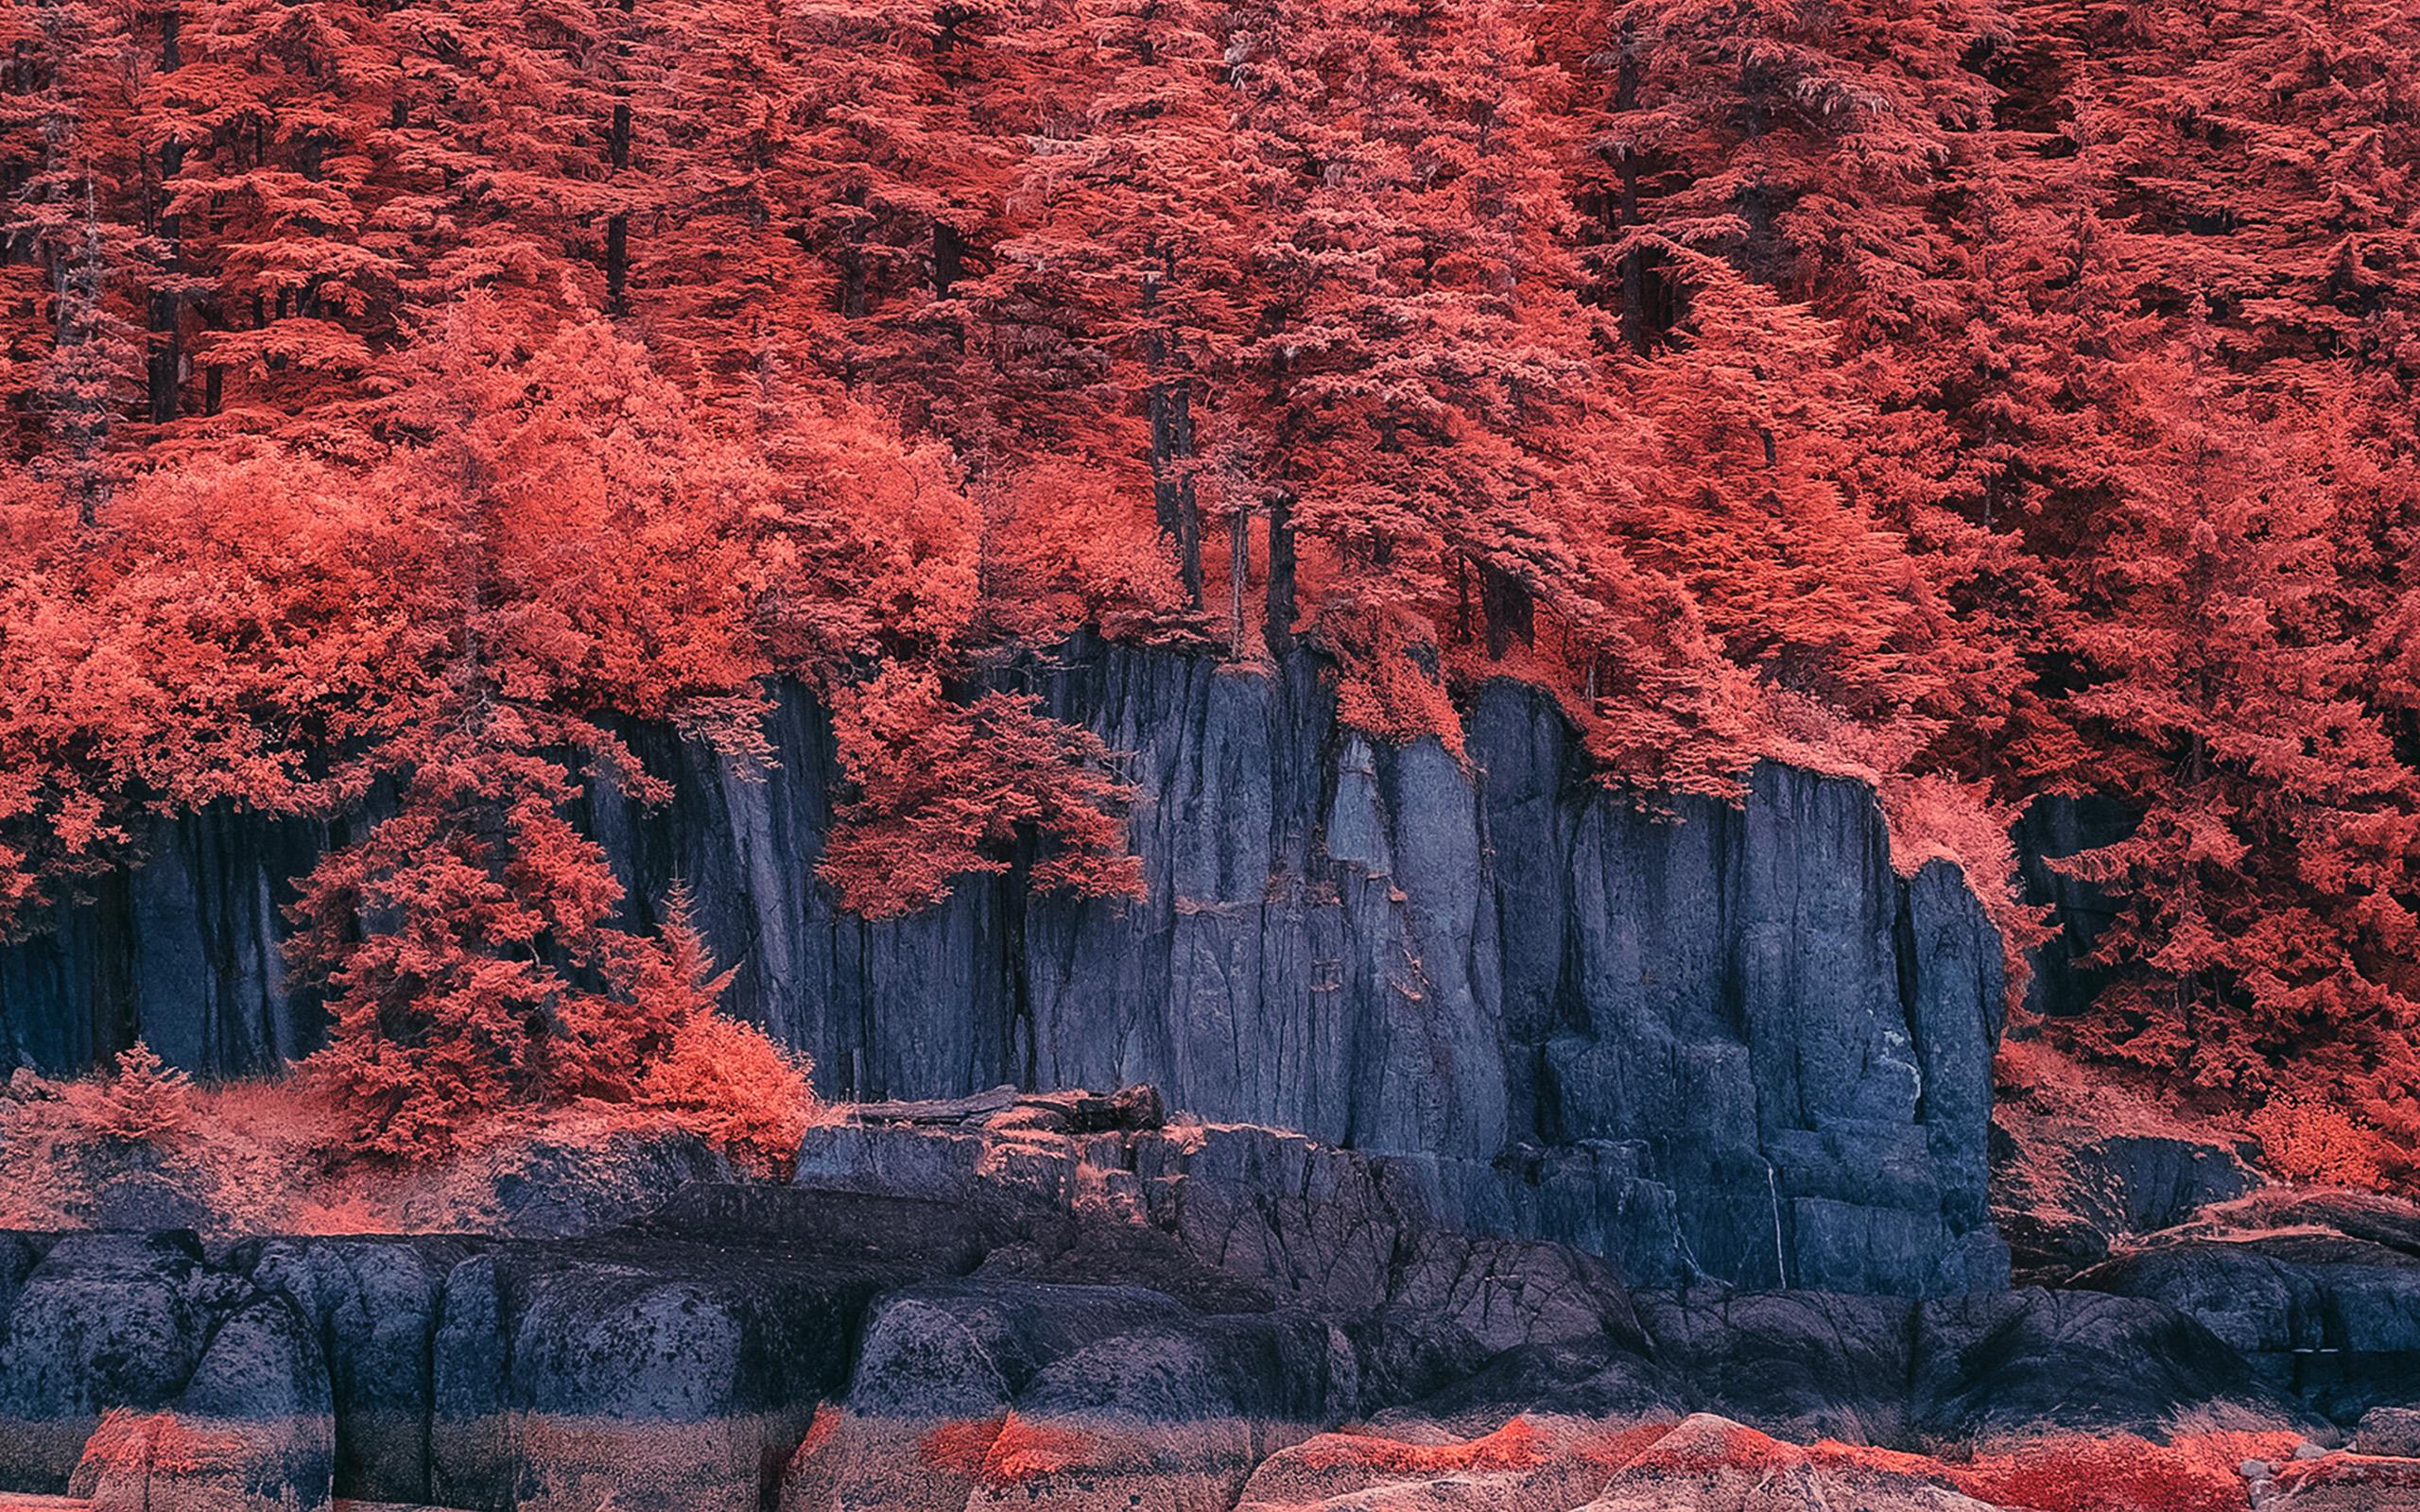 wallpaper for desktop, laptop | bd41-mountain-red-tree ...